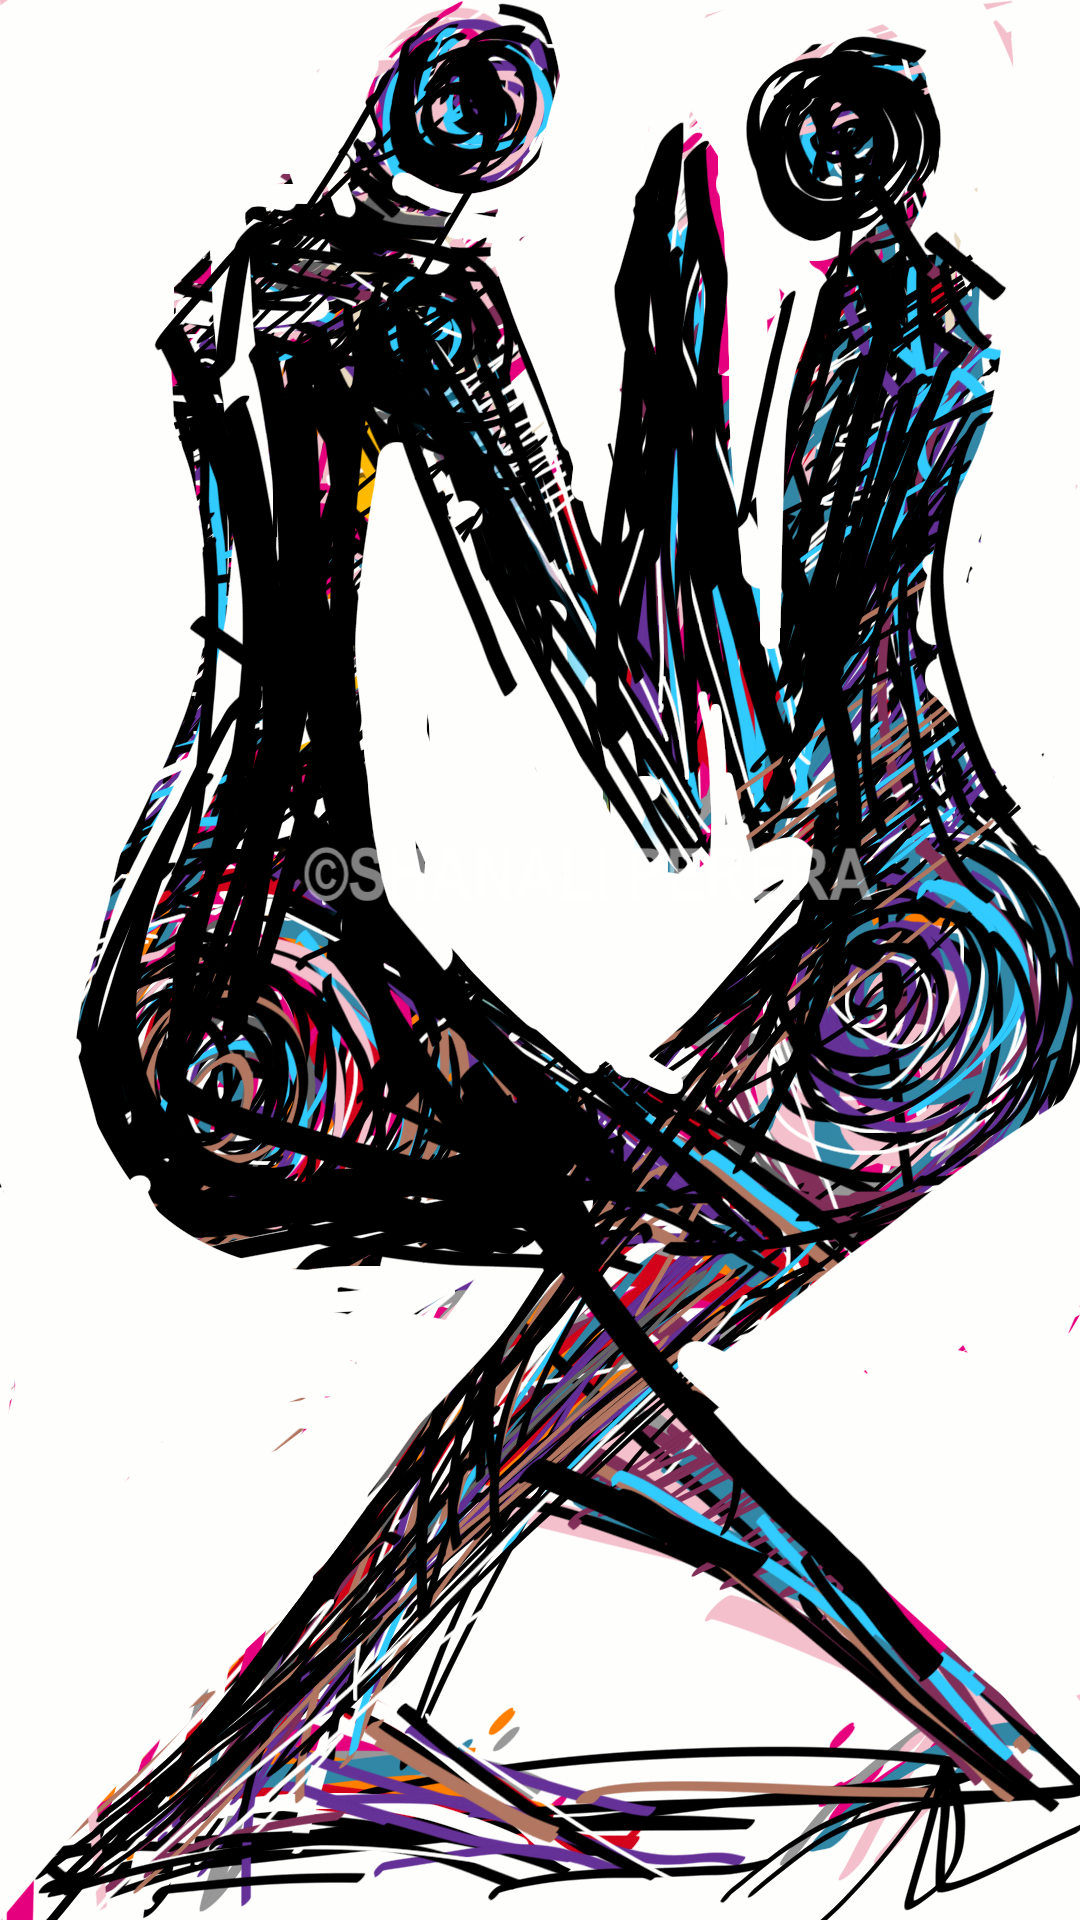 sketch-1508079026021.png